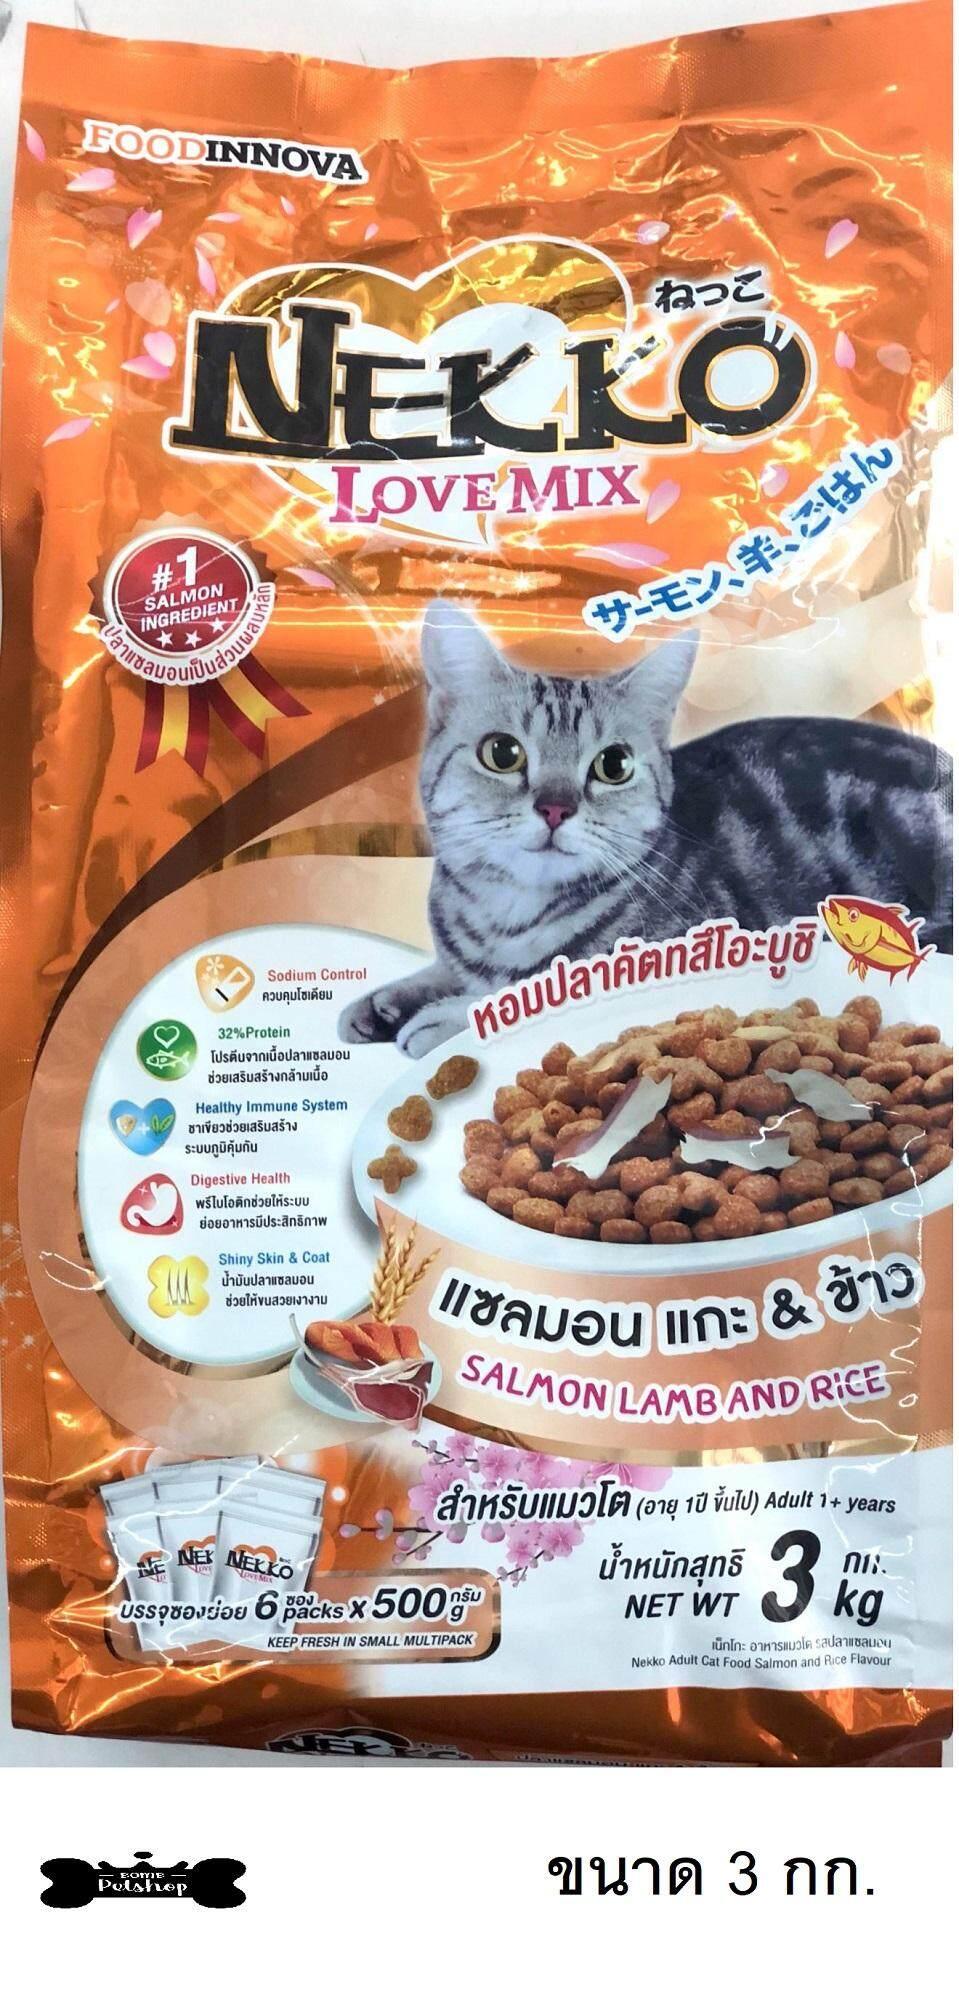 Nekko Cat Food 3kg อาหารแมว เม็ด แซลมอน แกะ ข้าว 3กก. By Bomb Petshop.